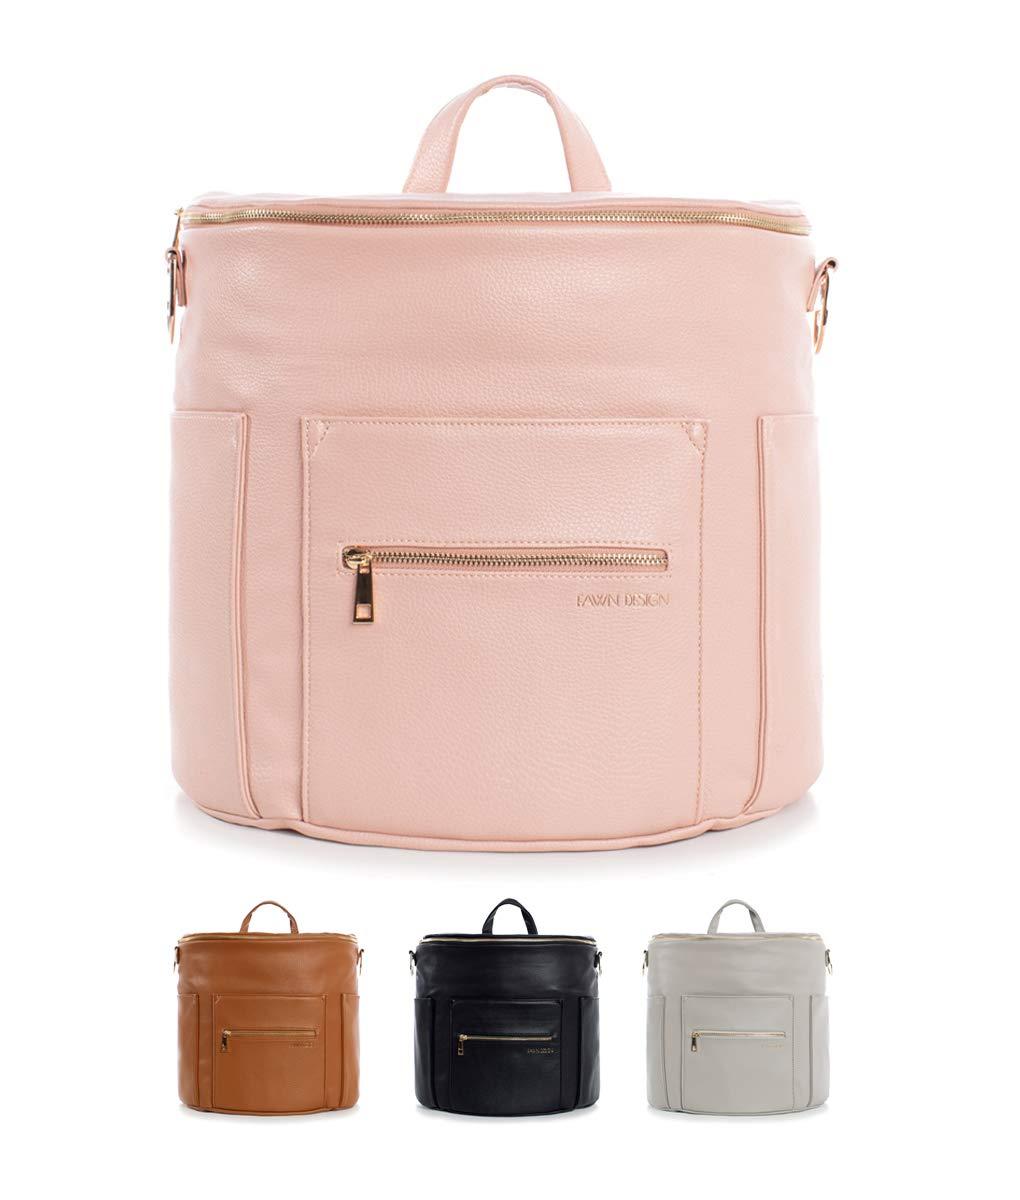 Fawn Design Premium Vegan Leather Diaper Bag and Backpack (Blush 2.0)